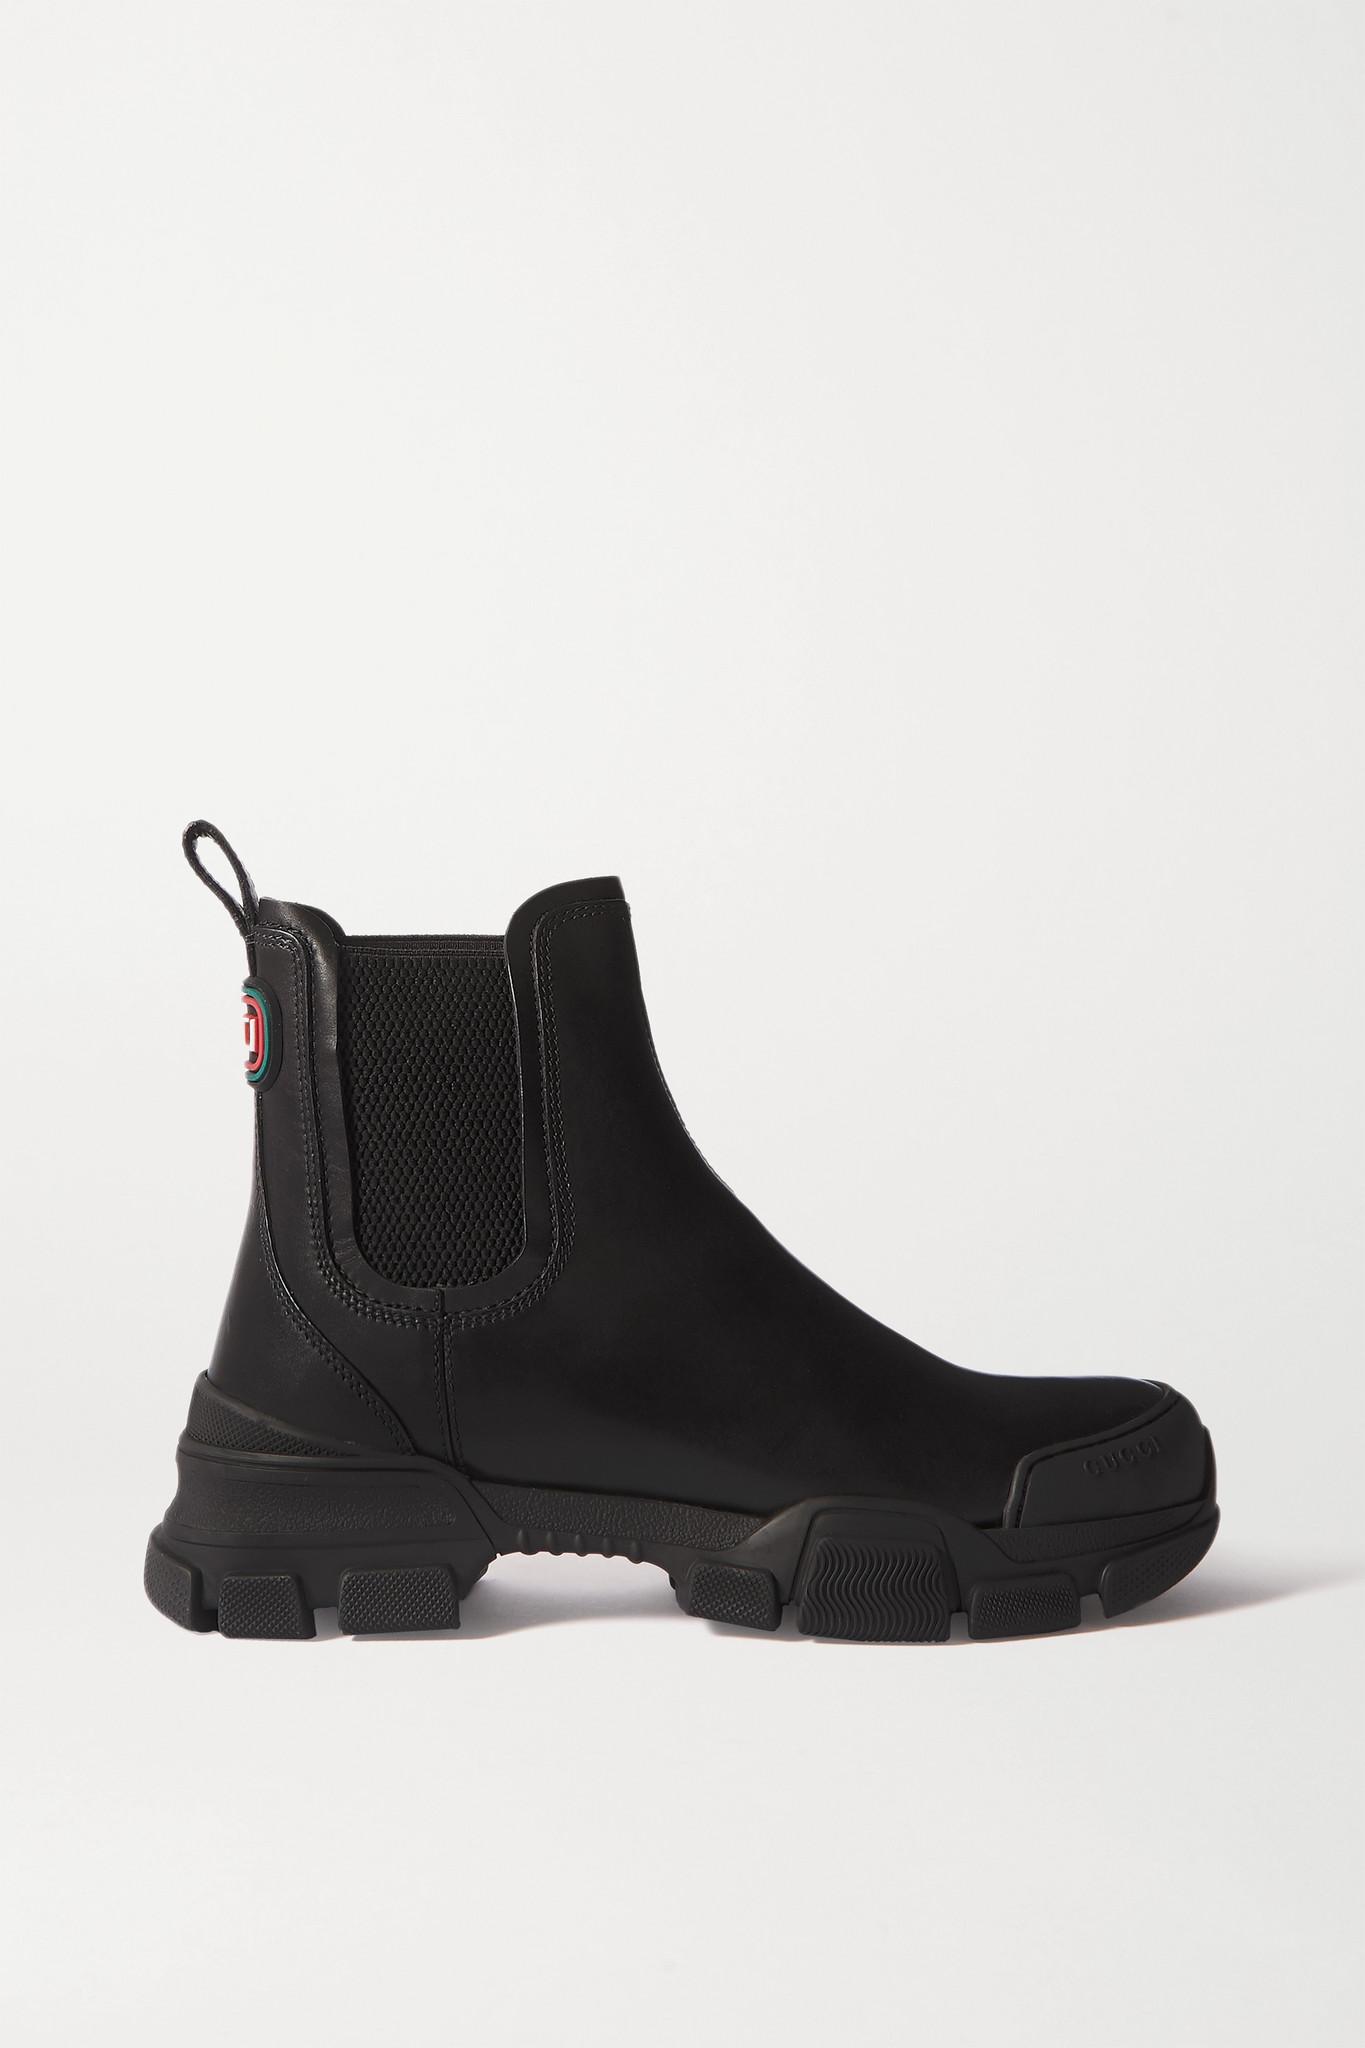 GUCCI - Leon Leather Chelsea Boots - Black - IT42